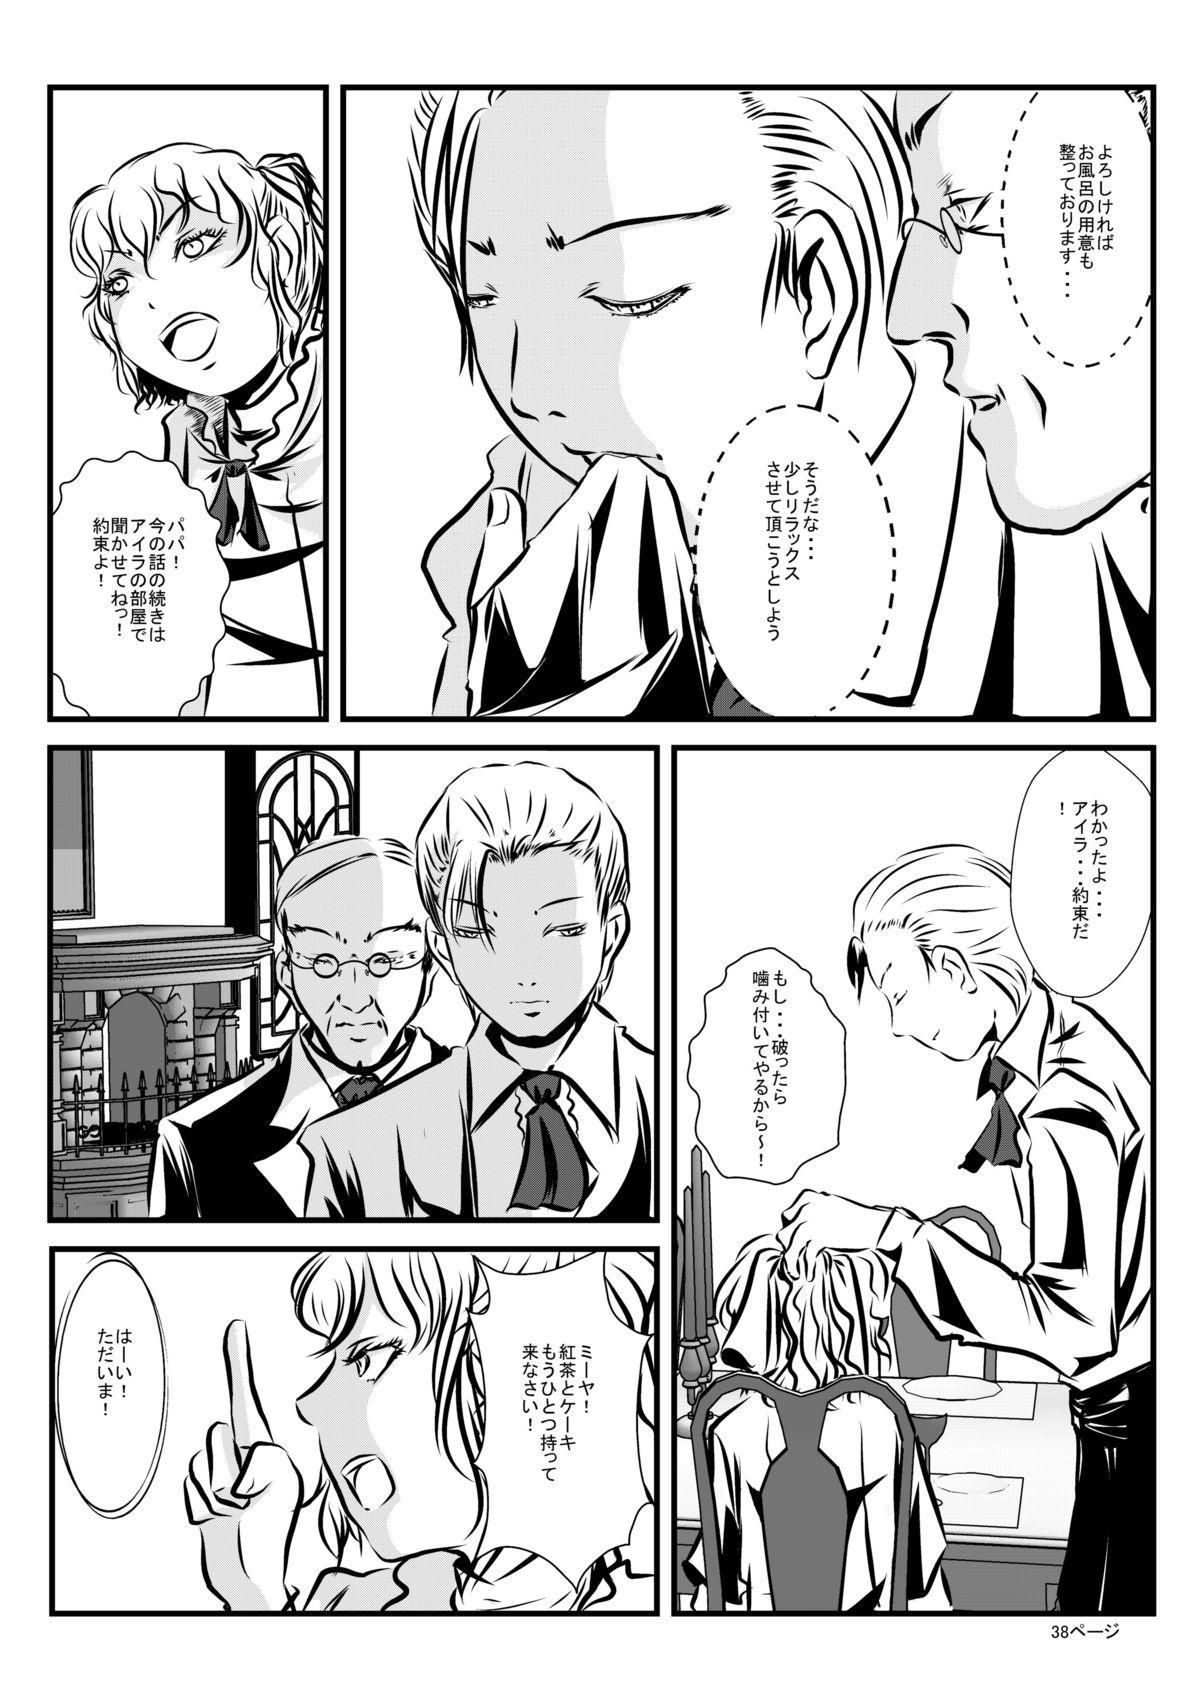 Loli Type no Jikkensitsu 36